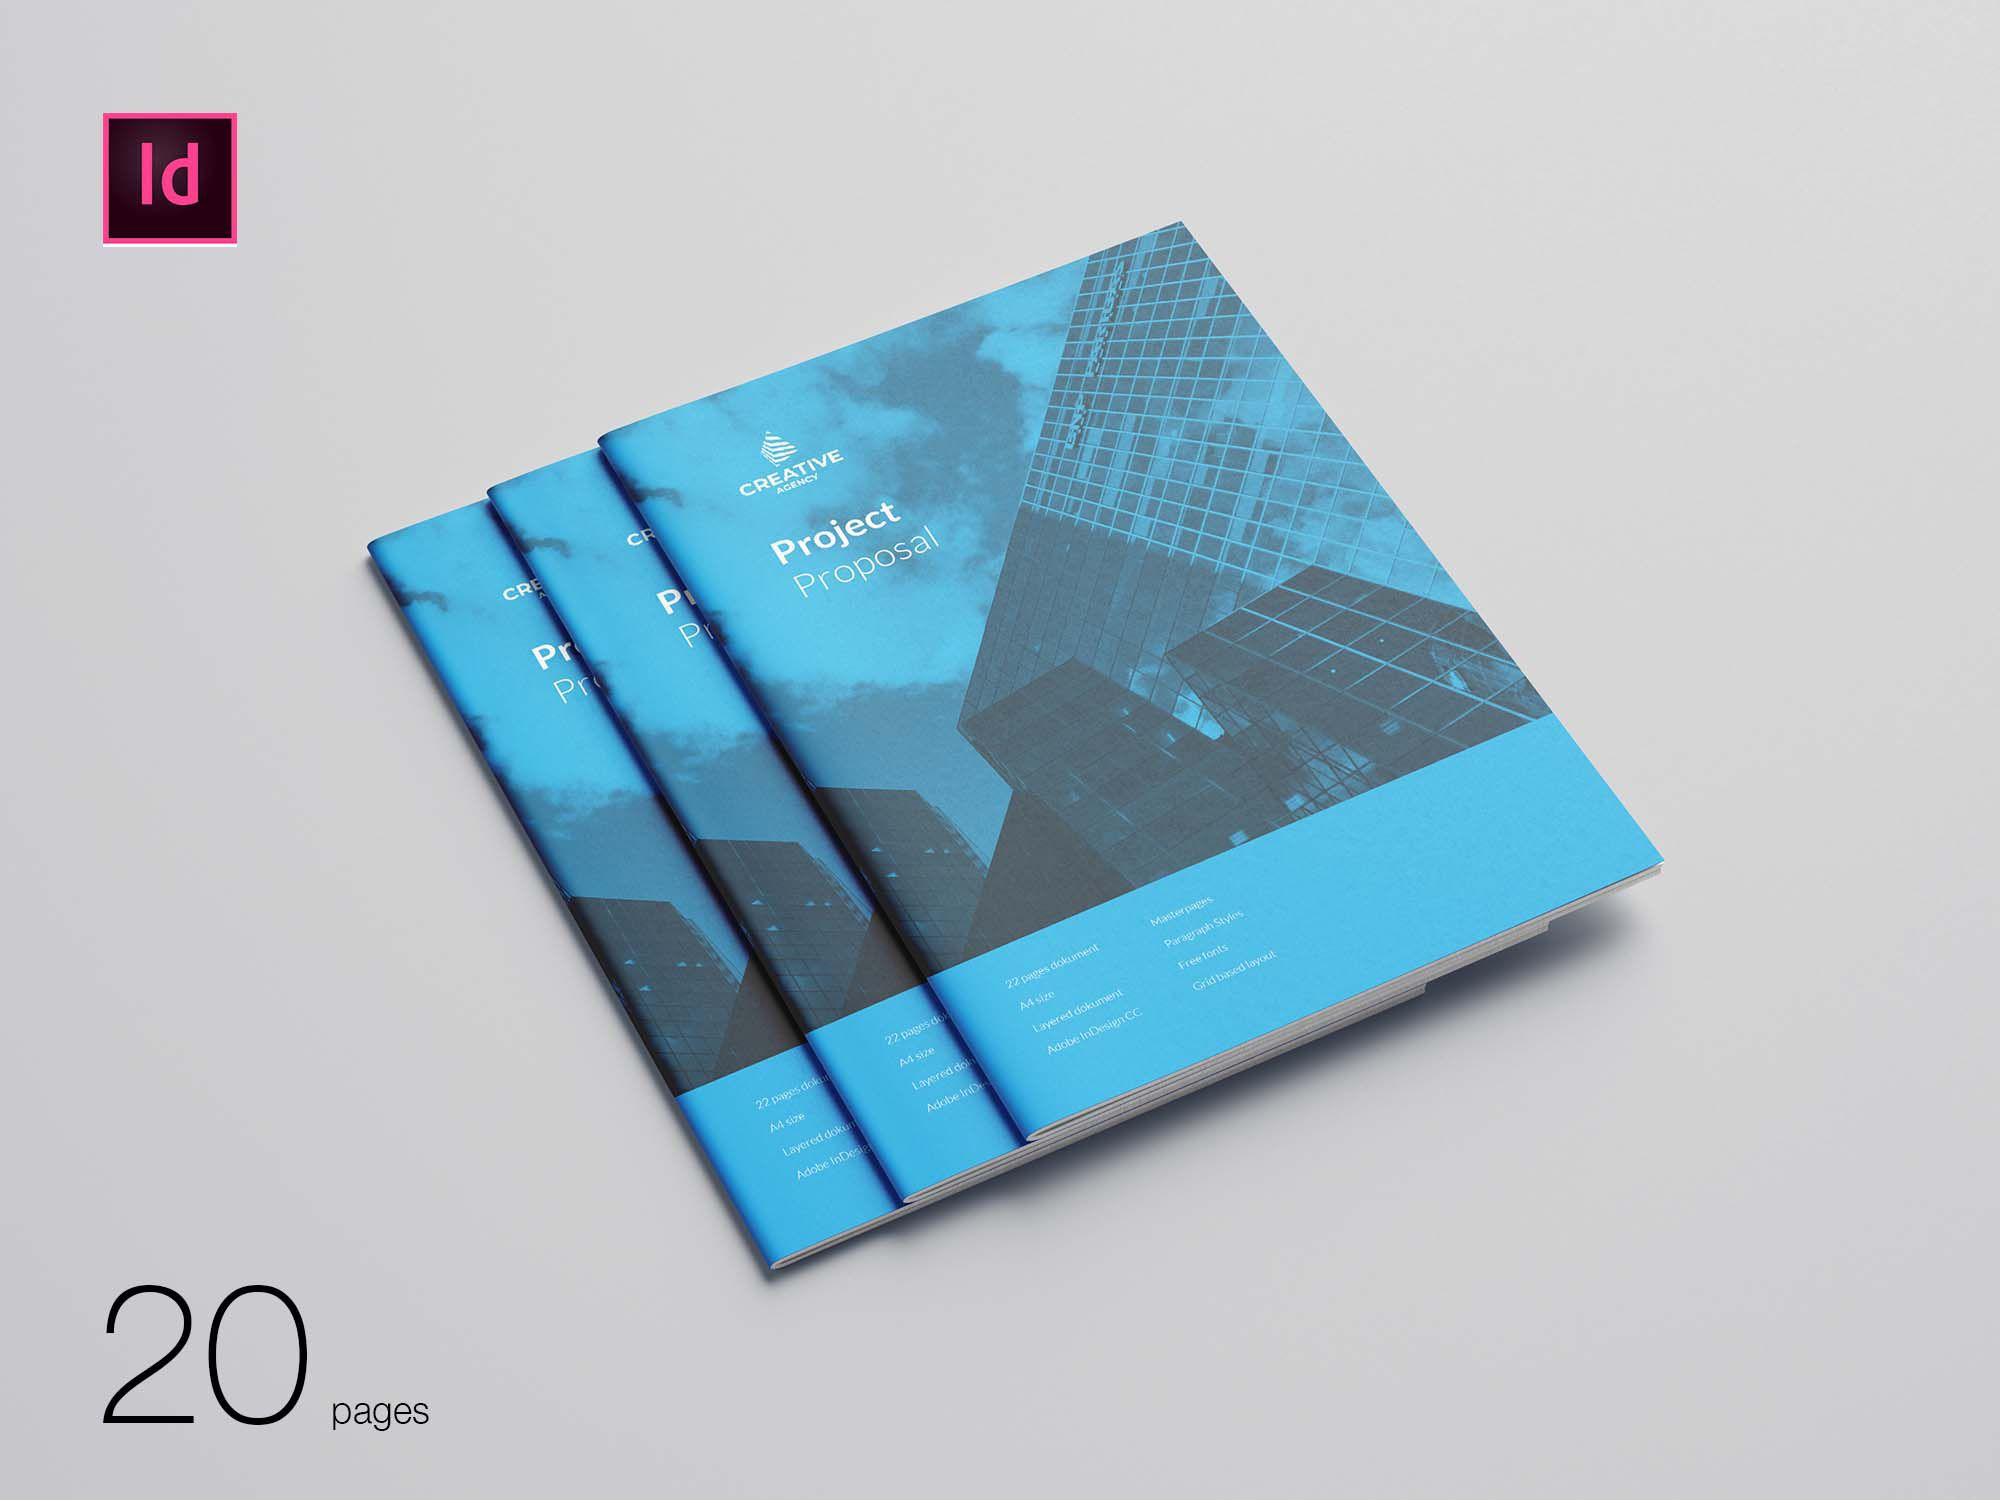 003 Striking Free Busines Proposal Template Indesign Design Full